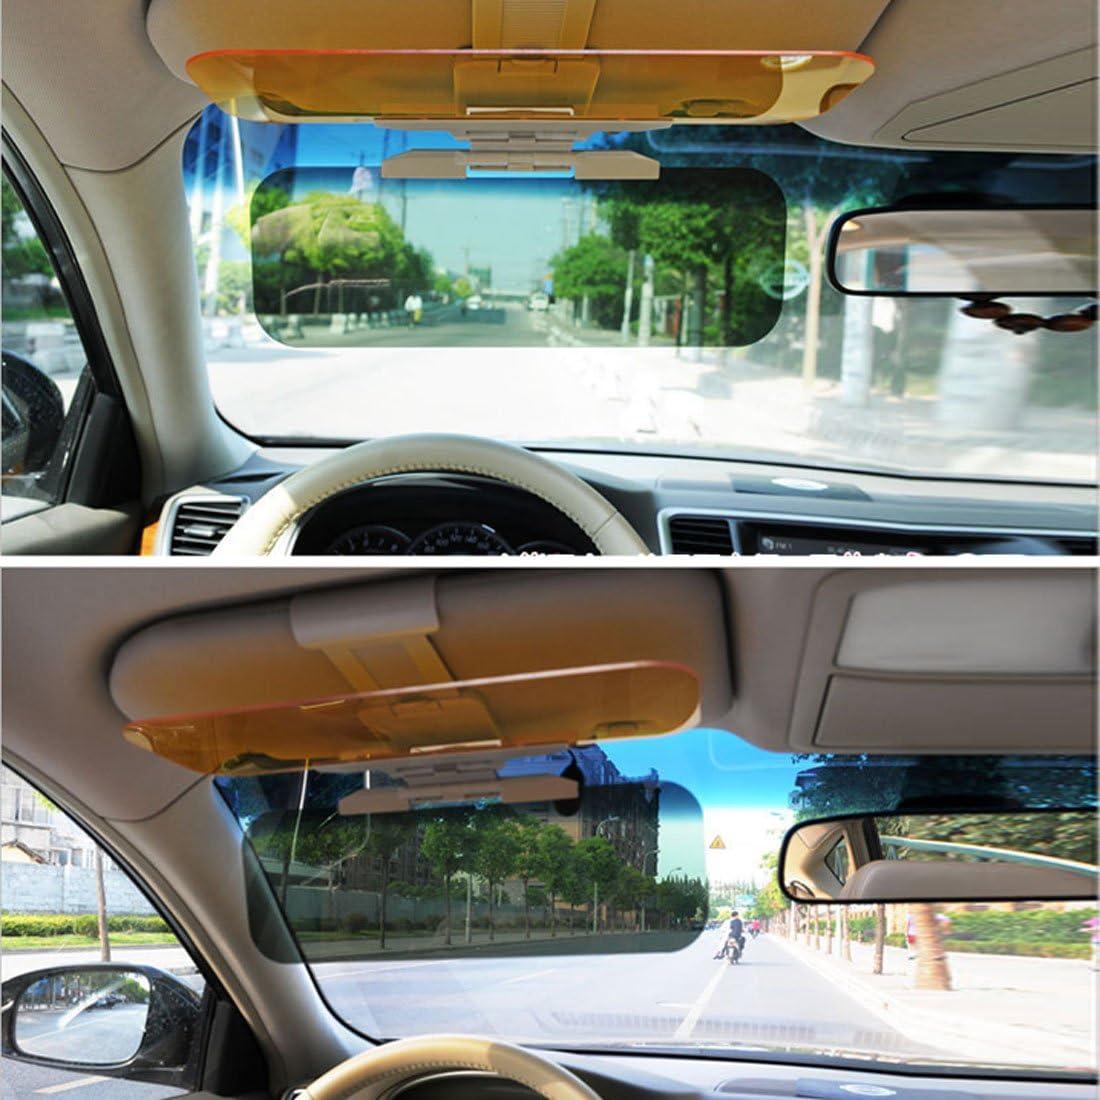 Andux Zone voiture 2/en 1/Transparent anti-riflesso Vetro voiture soleil Visi/ère par jour /& nuit Di Guida qc-fxj01